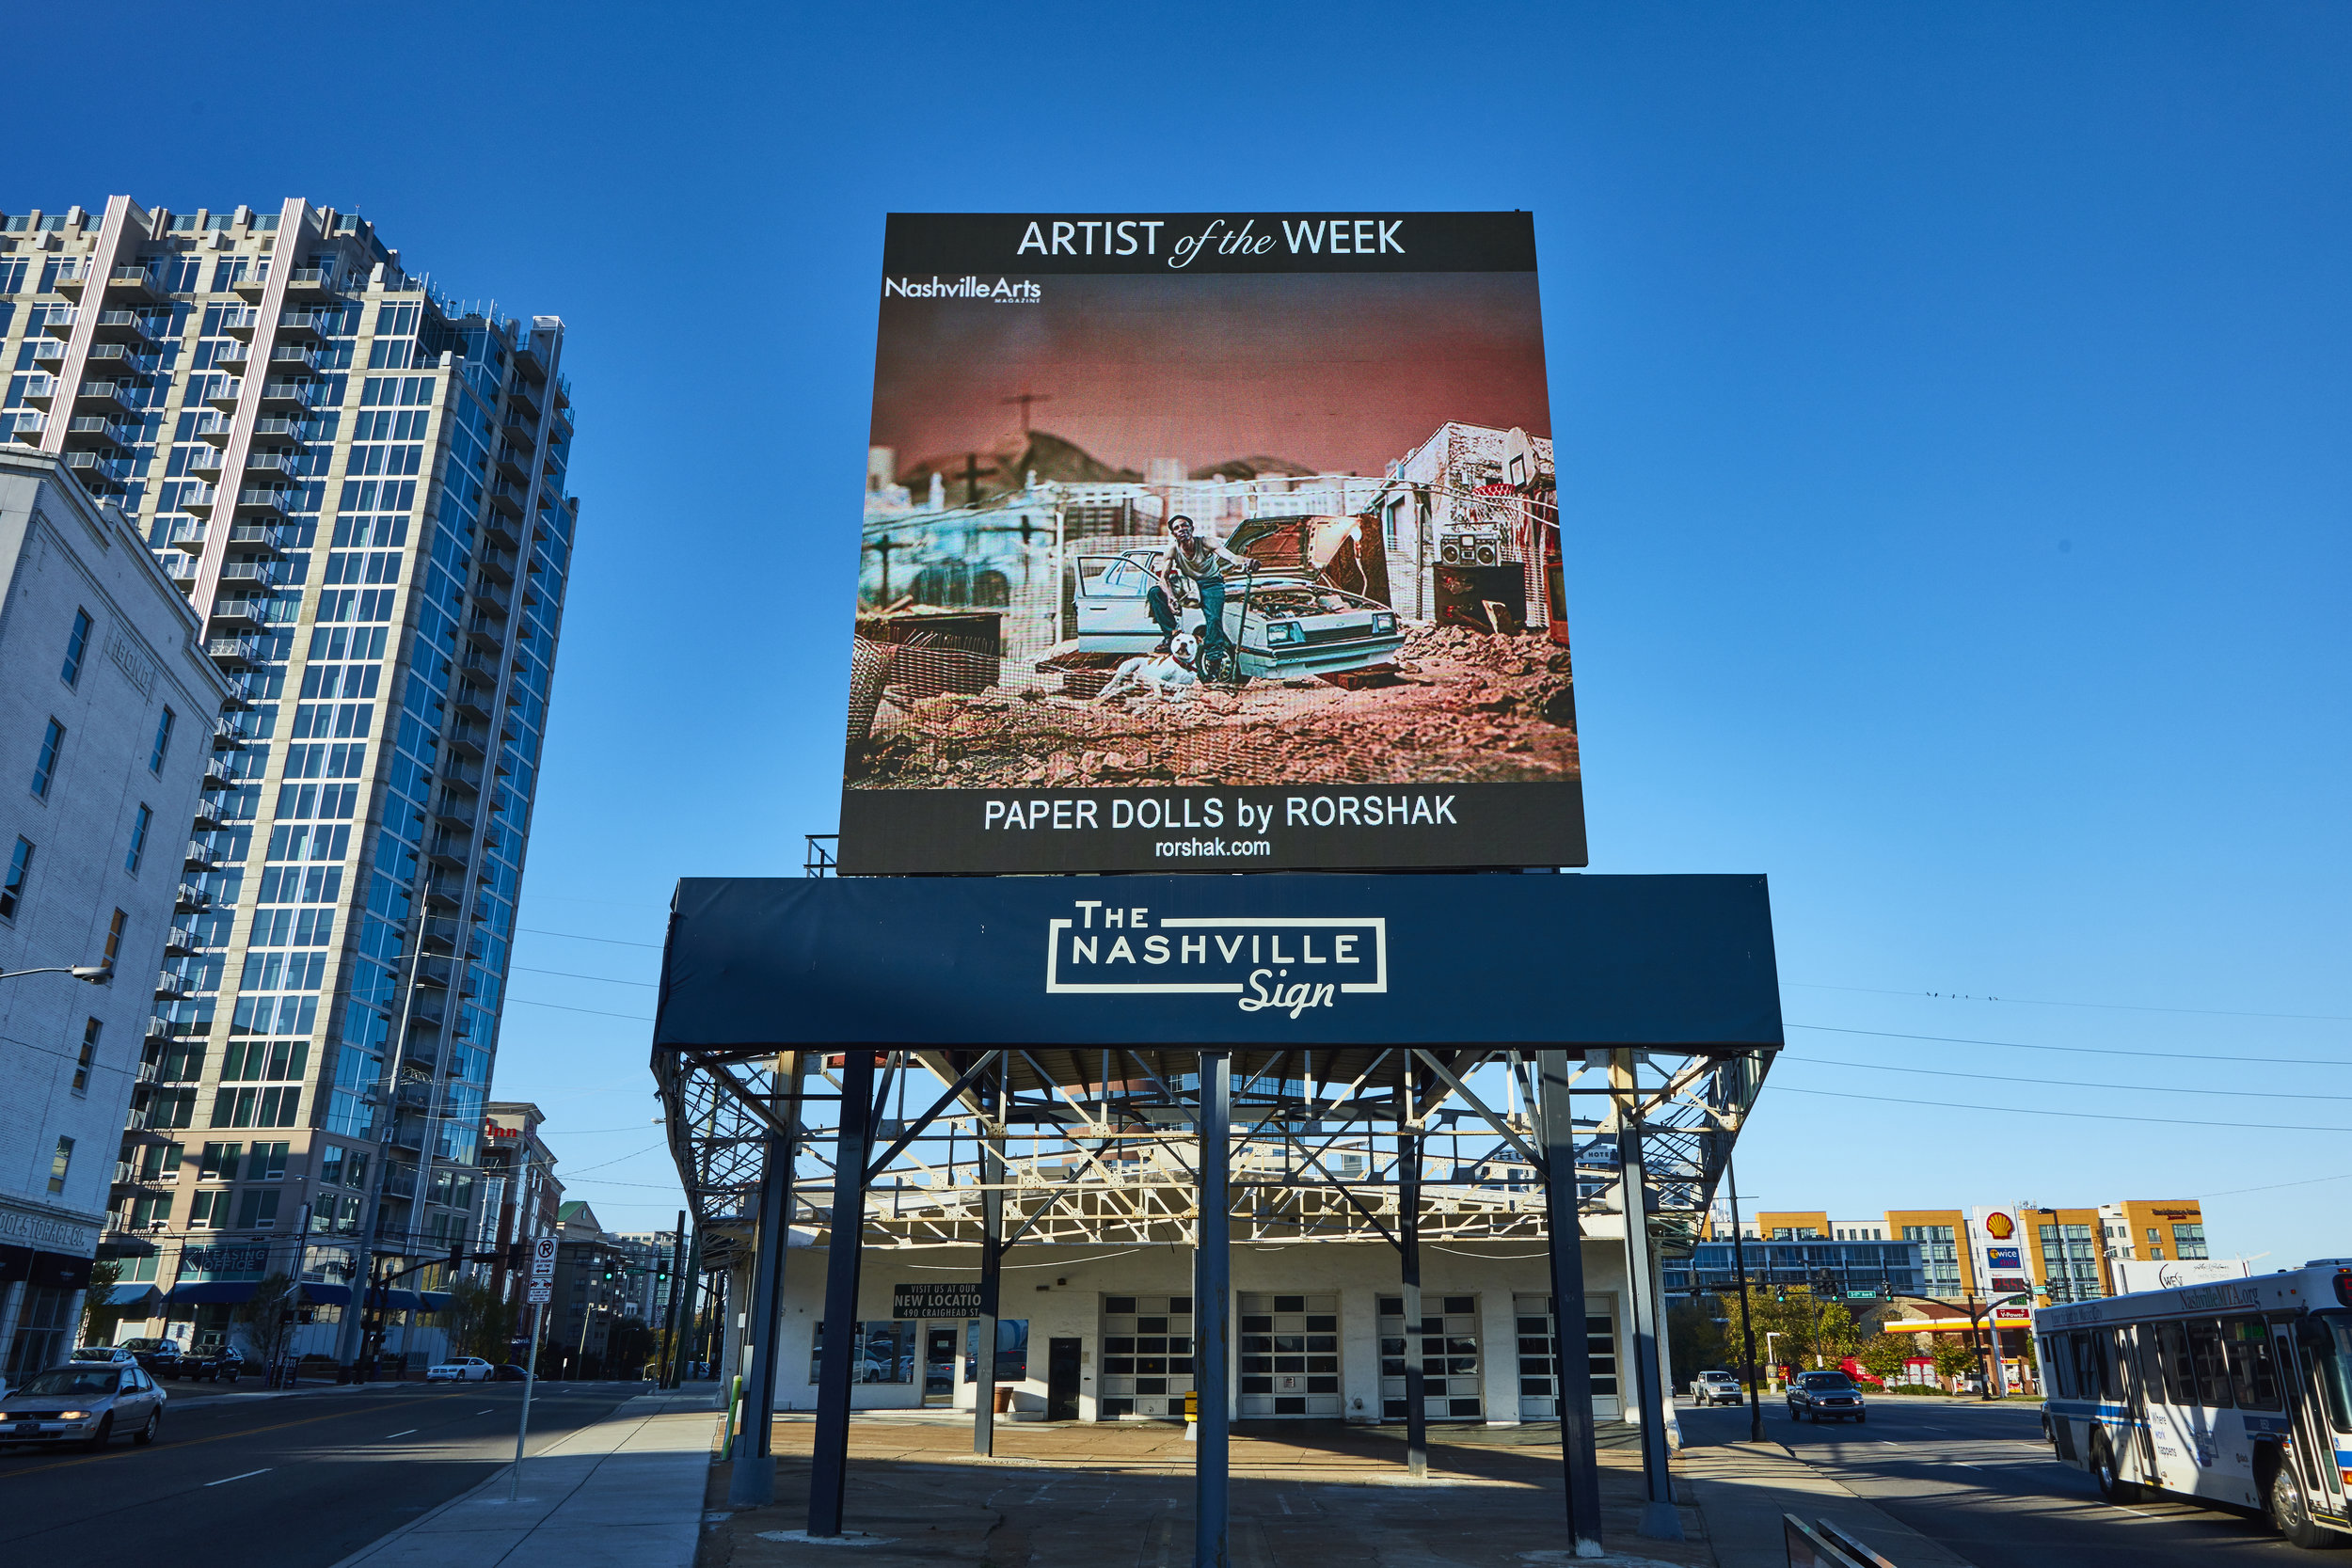 rorshak_billboard 14.jpg